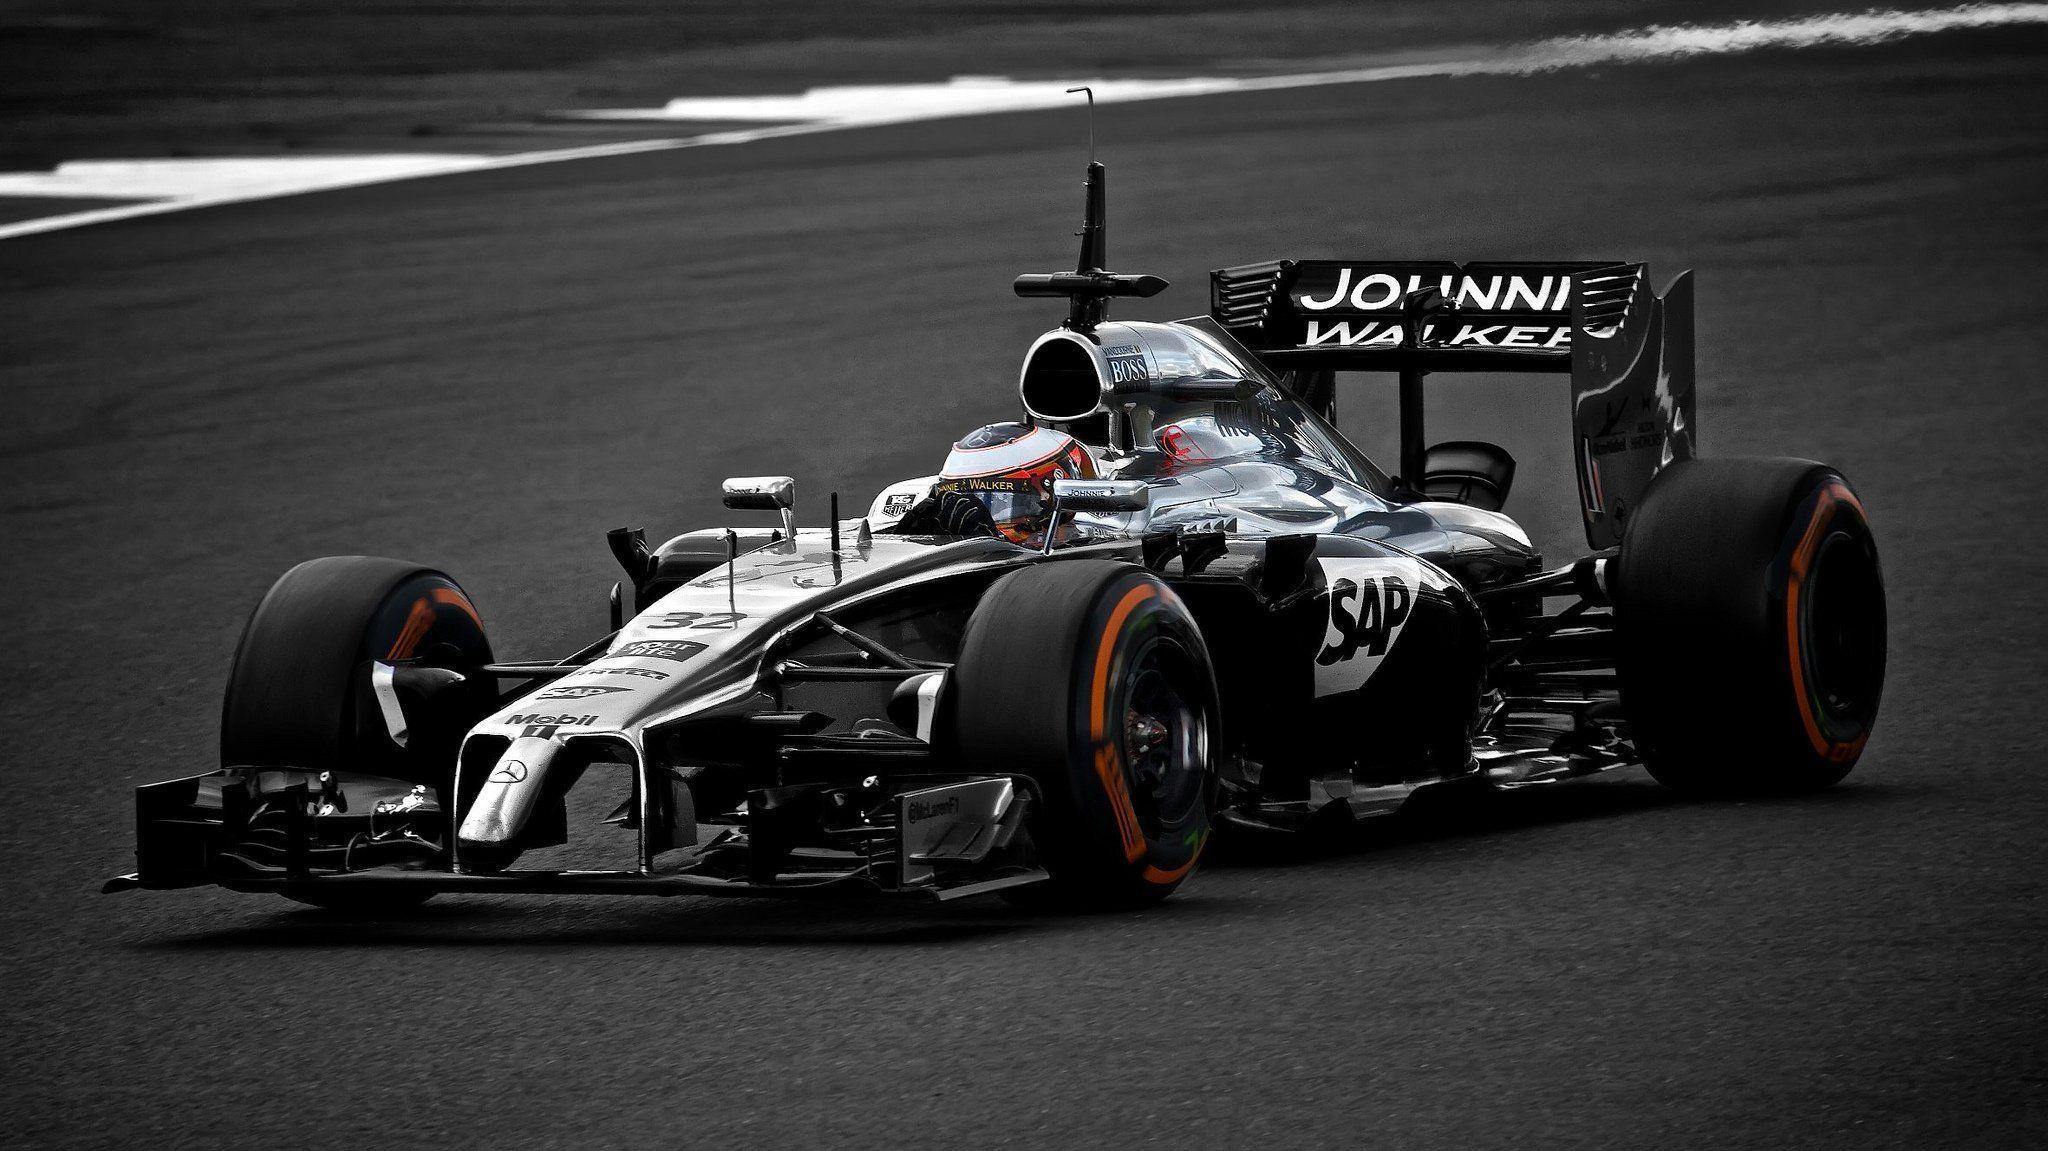 Mclaren F1 Wallpaper Hd 59 Images: Mercedes F1 Wallpapers